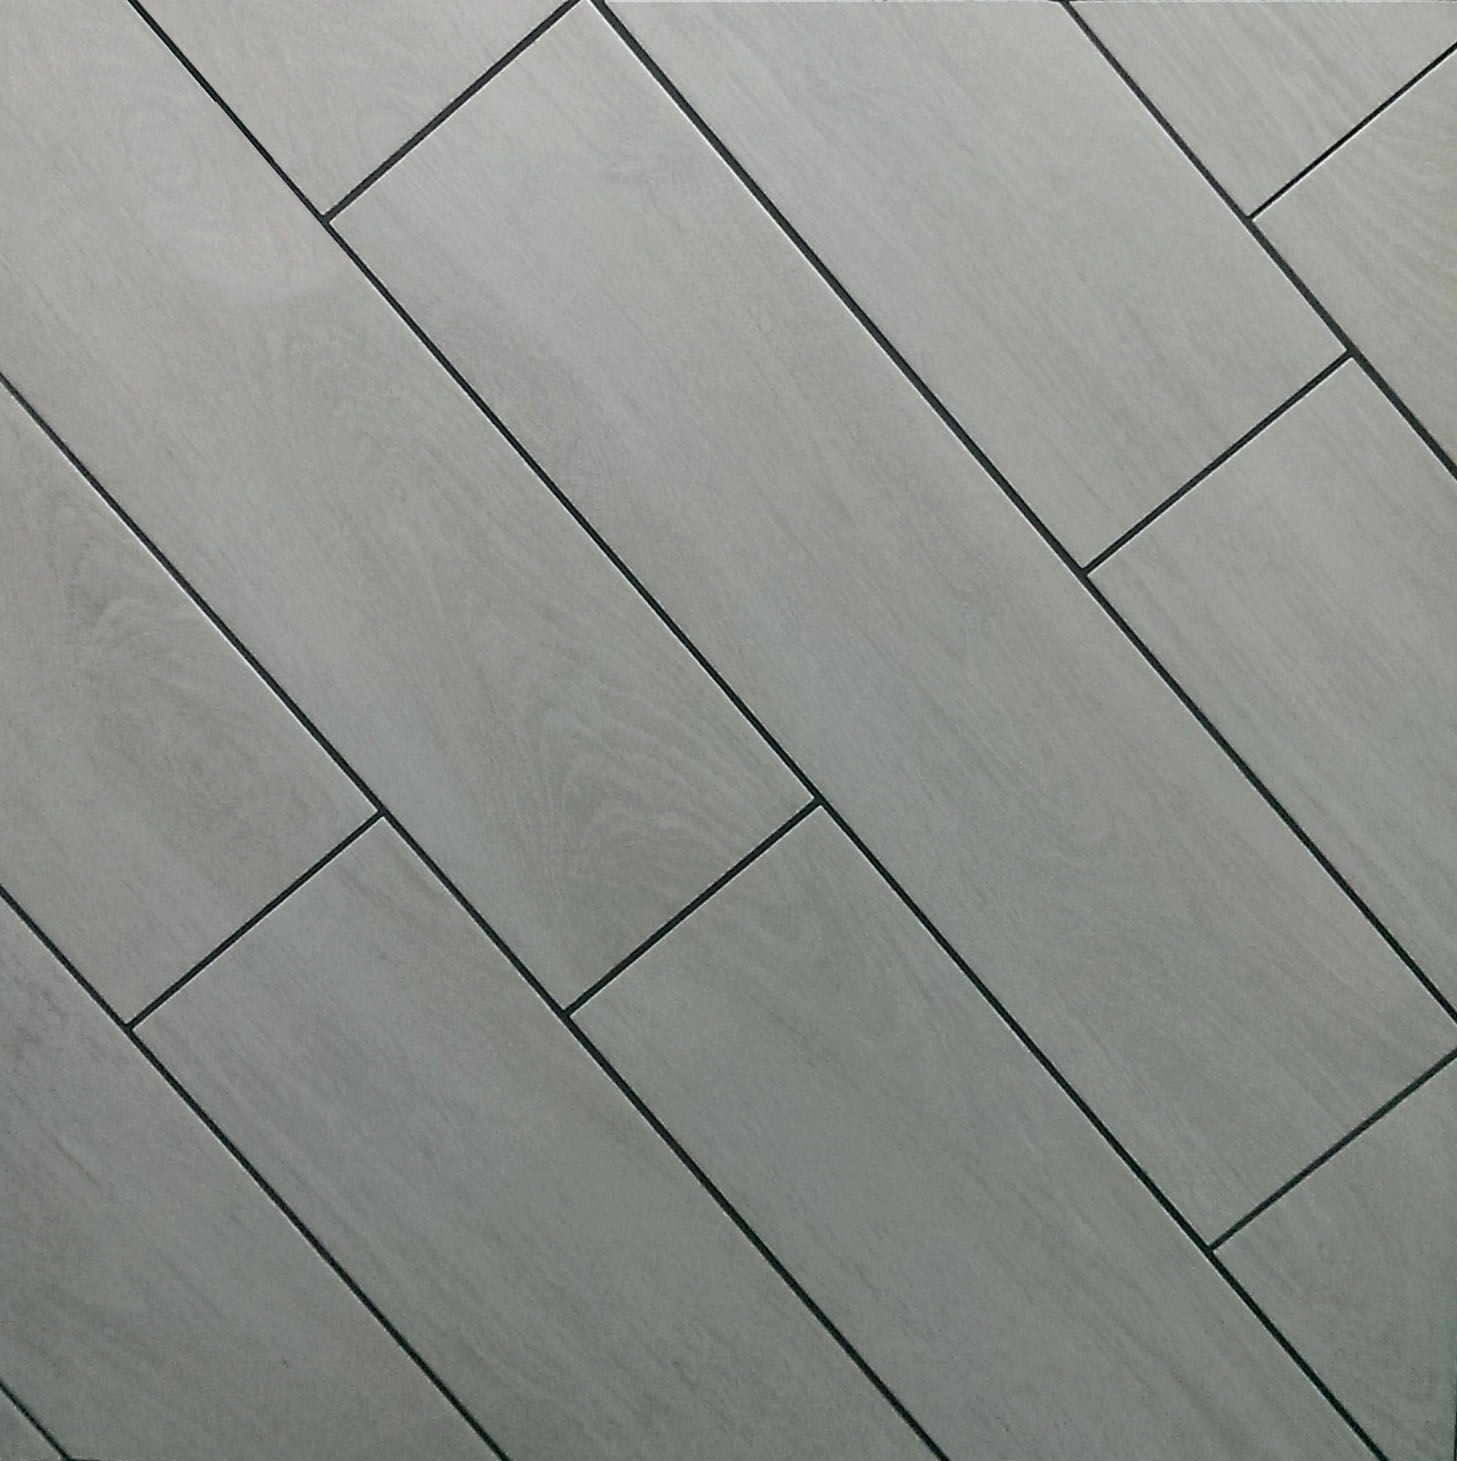 Colorado Abeto Porcelain Tiles In 2019 Grey Floor